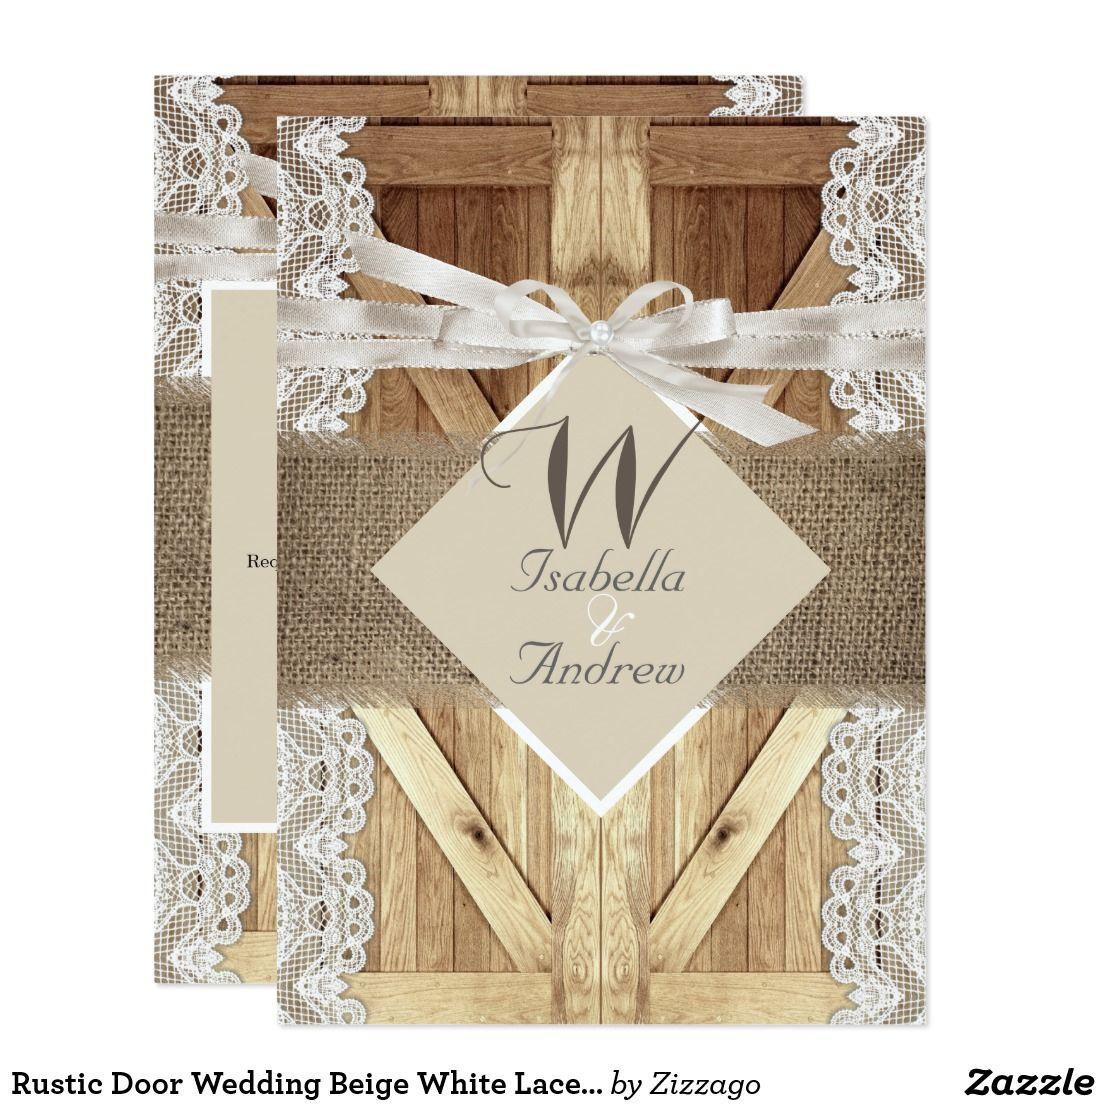 Rustic Door Wedding Beige White Lace Wood Burlap Card Wooden Barn And Hessian Country Marriage: Wedding Invitations Barn Door At Websimilar.org